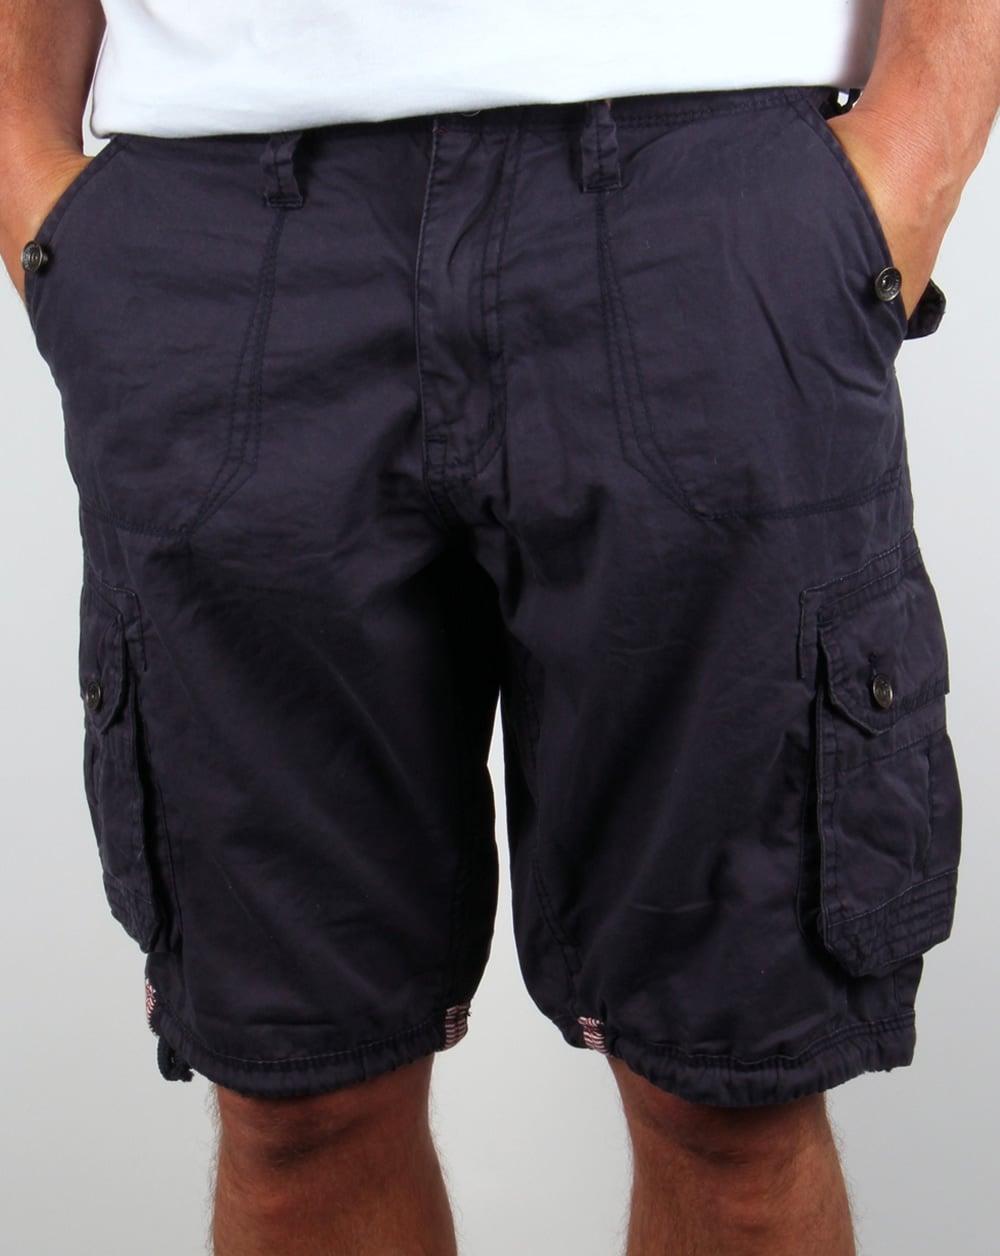 Ringspun Combat Shorts Navy Blue,cargo,multi pocket,mens